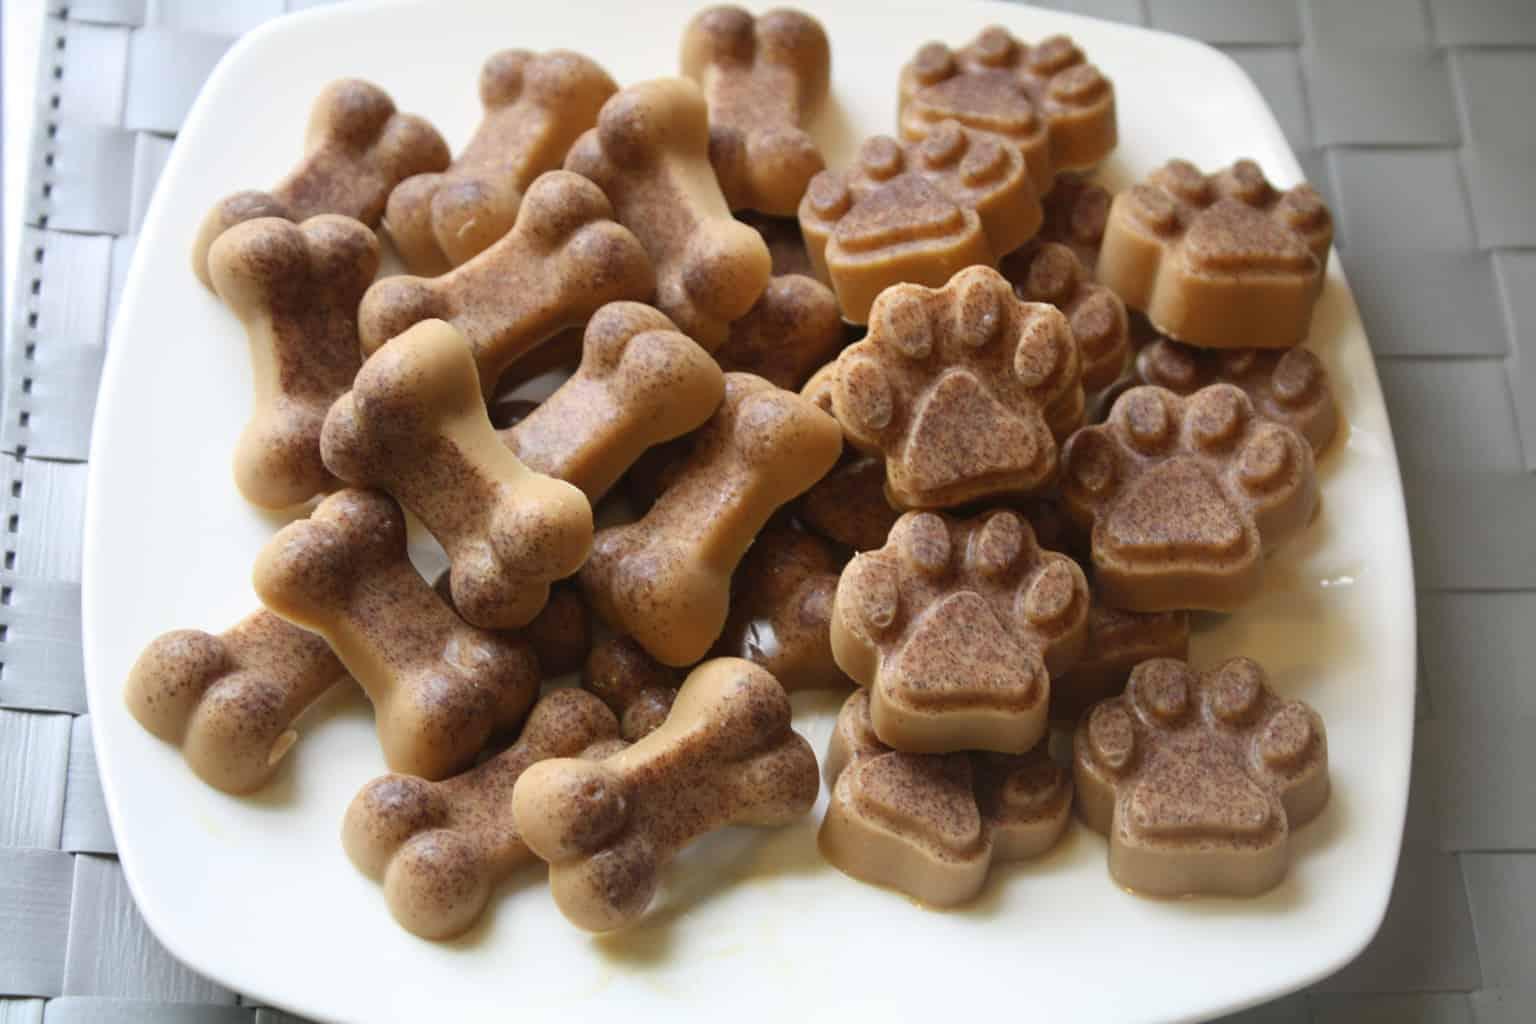 How to make homemade dog treats with bullyade